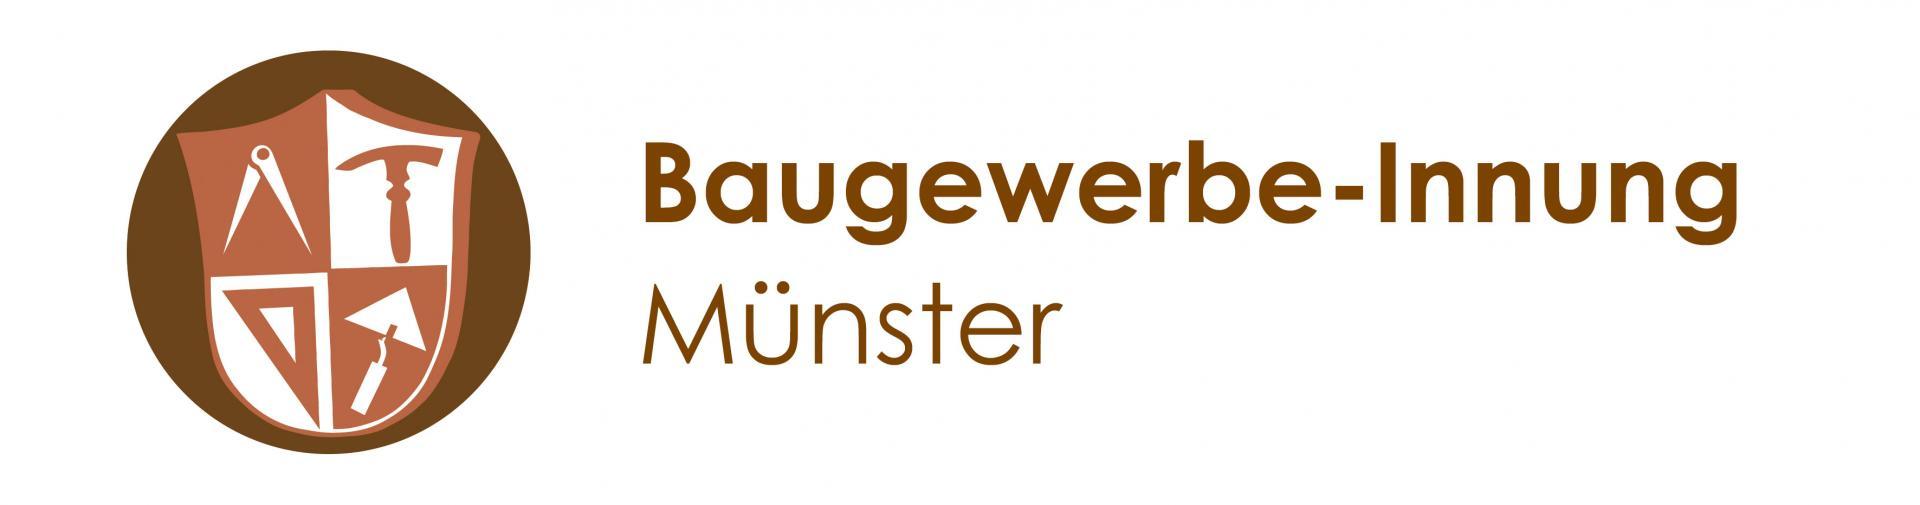 Baugewerbe Münster